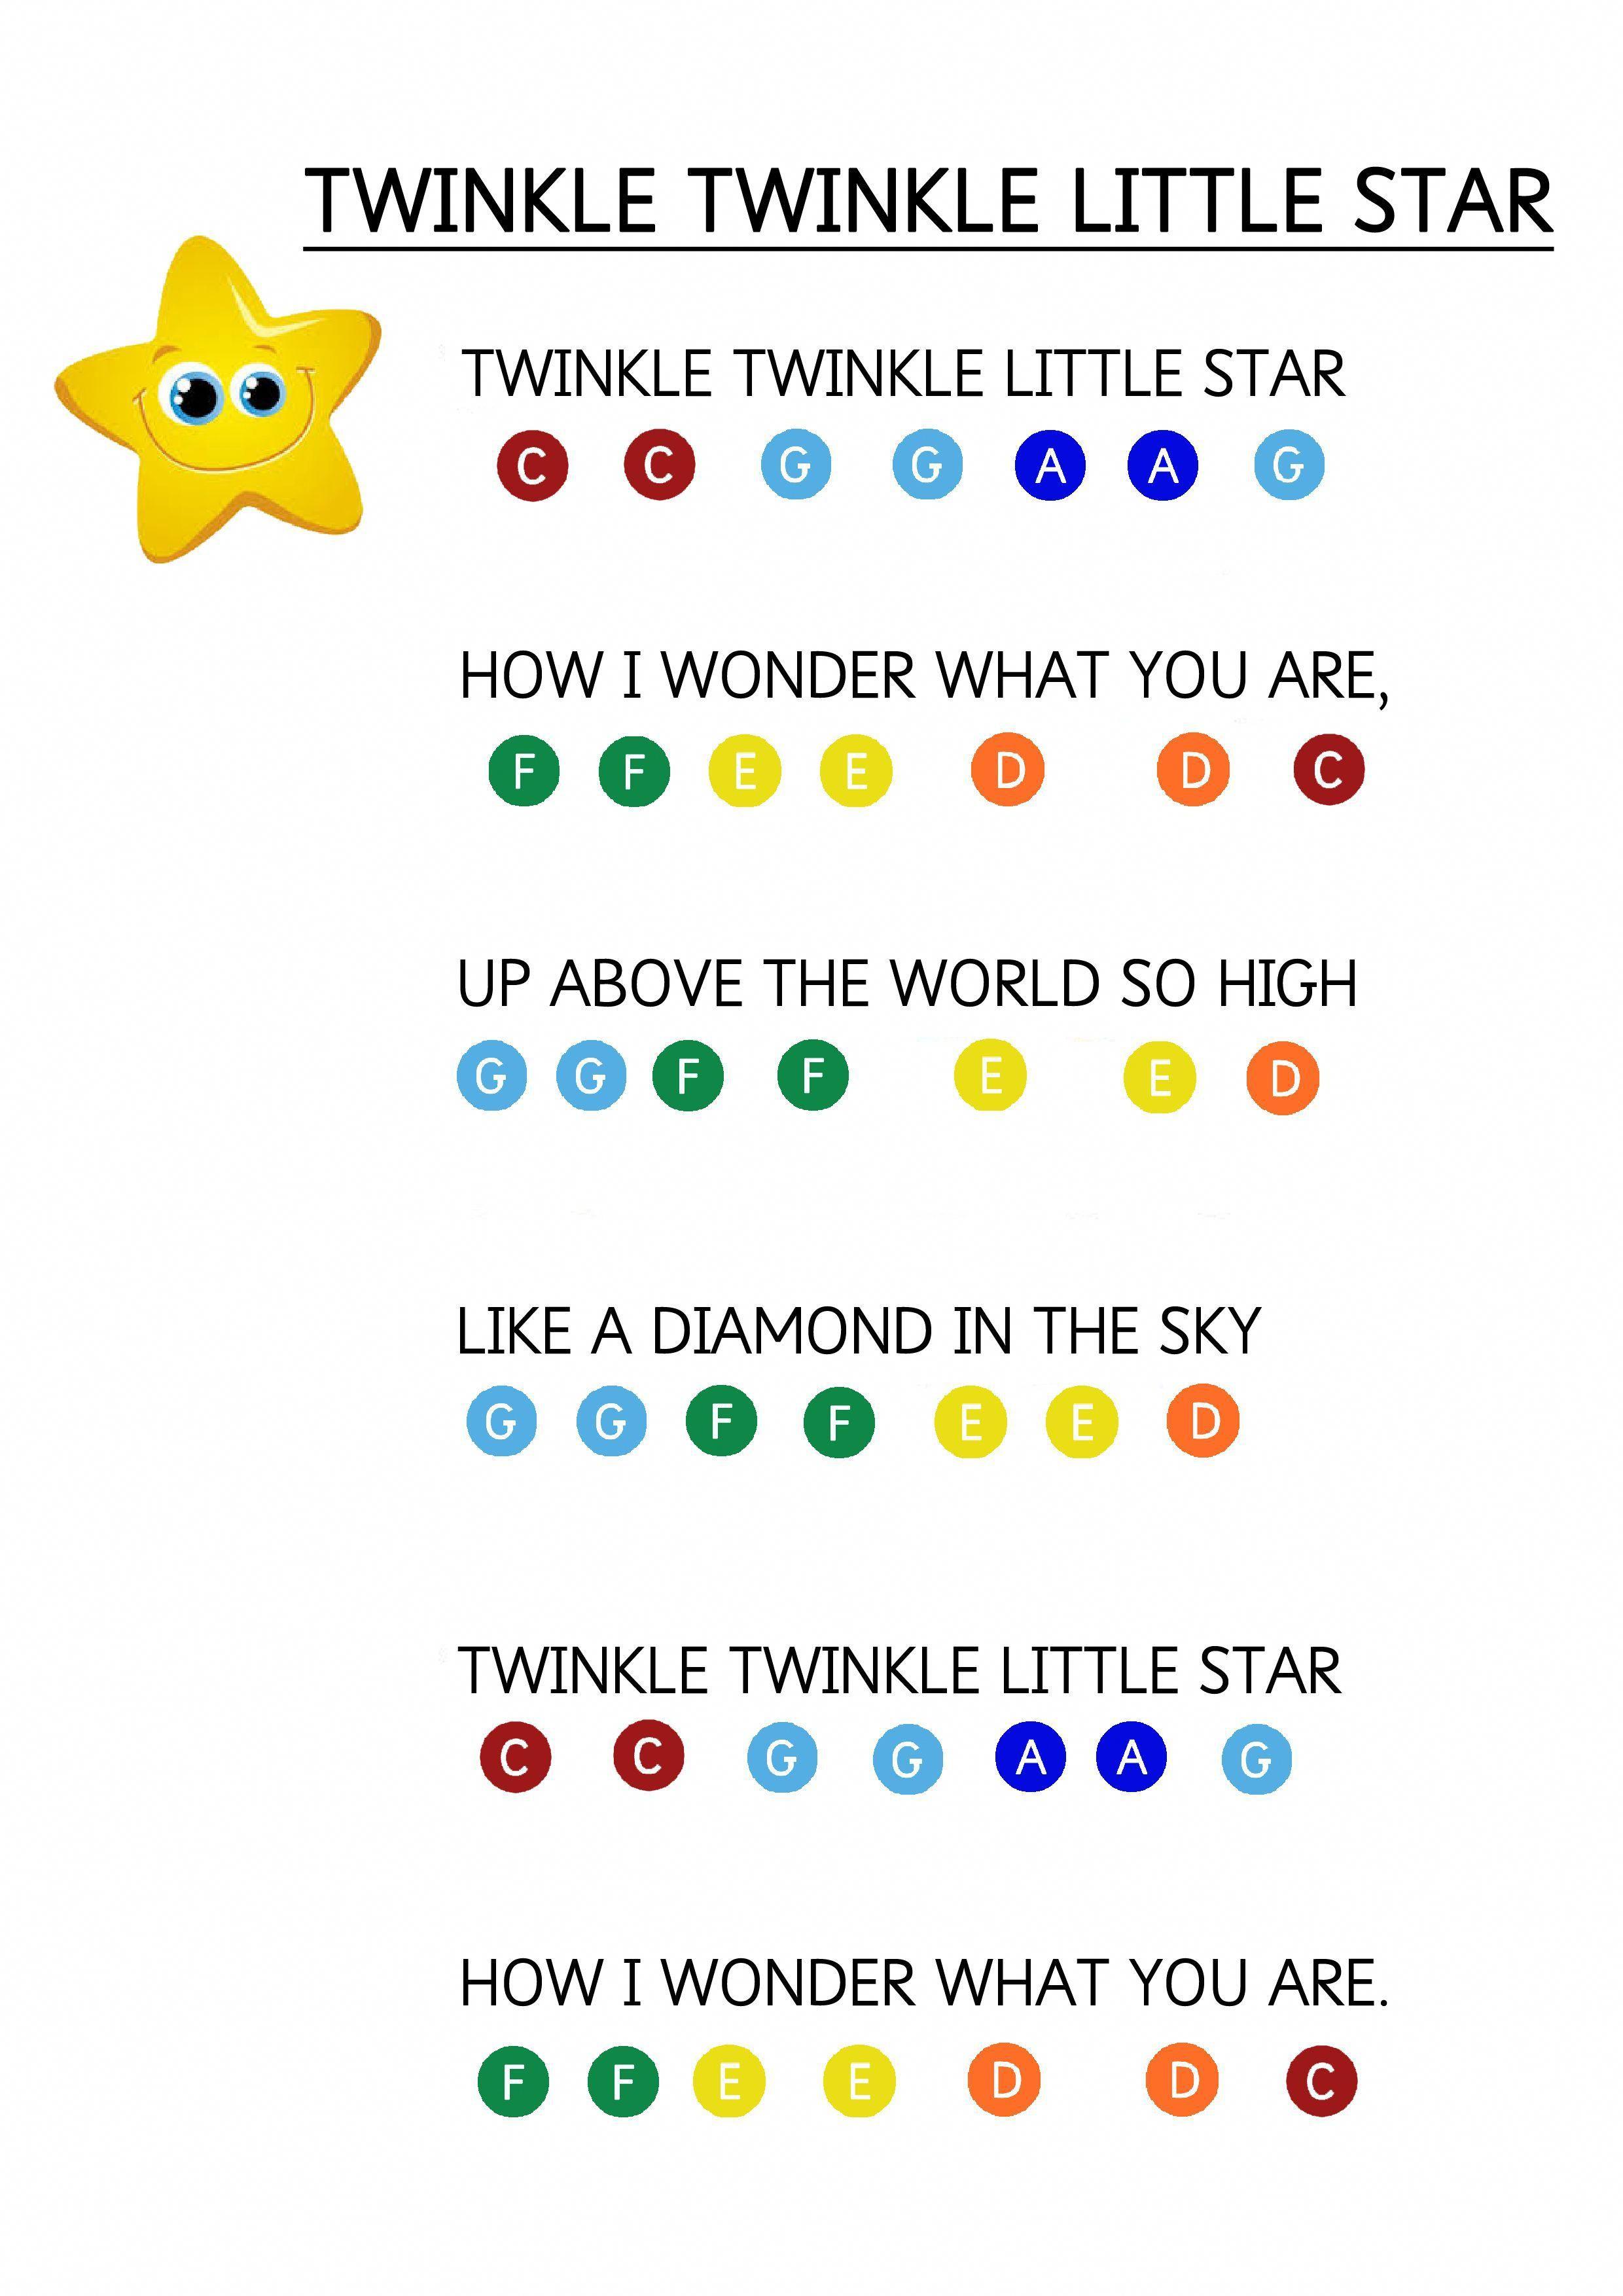 Twinkle twinkle litter star easy piano music sheet for